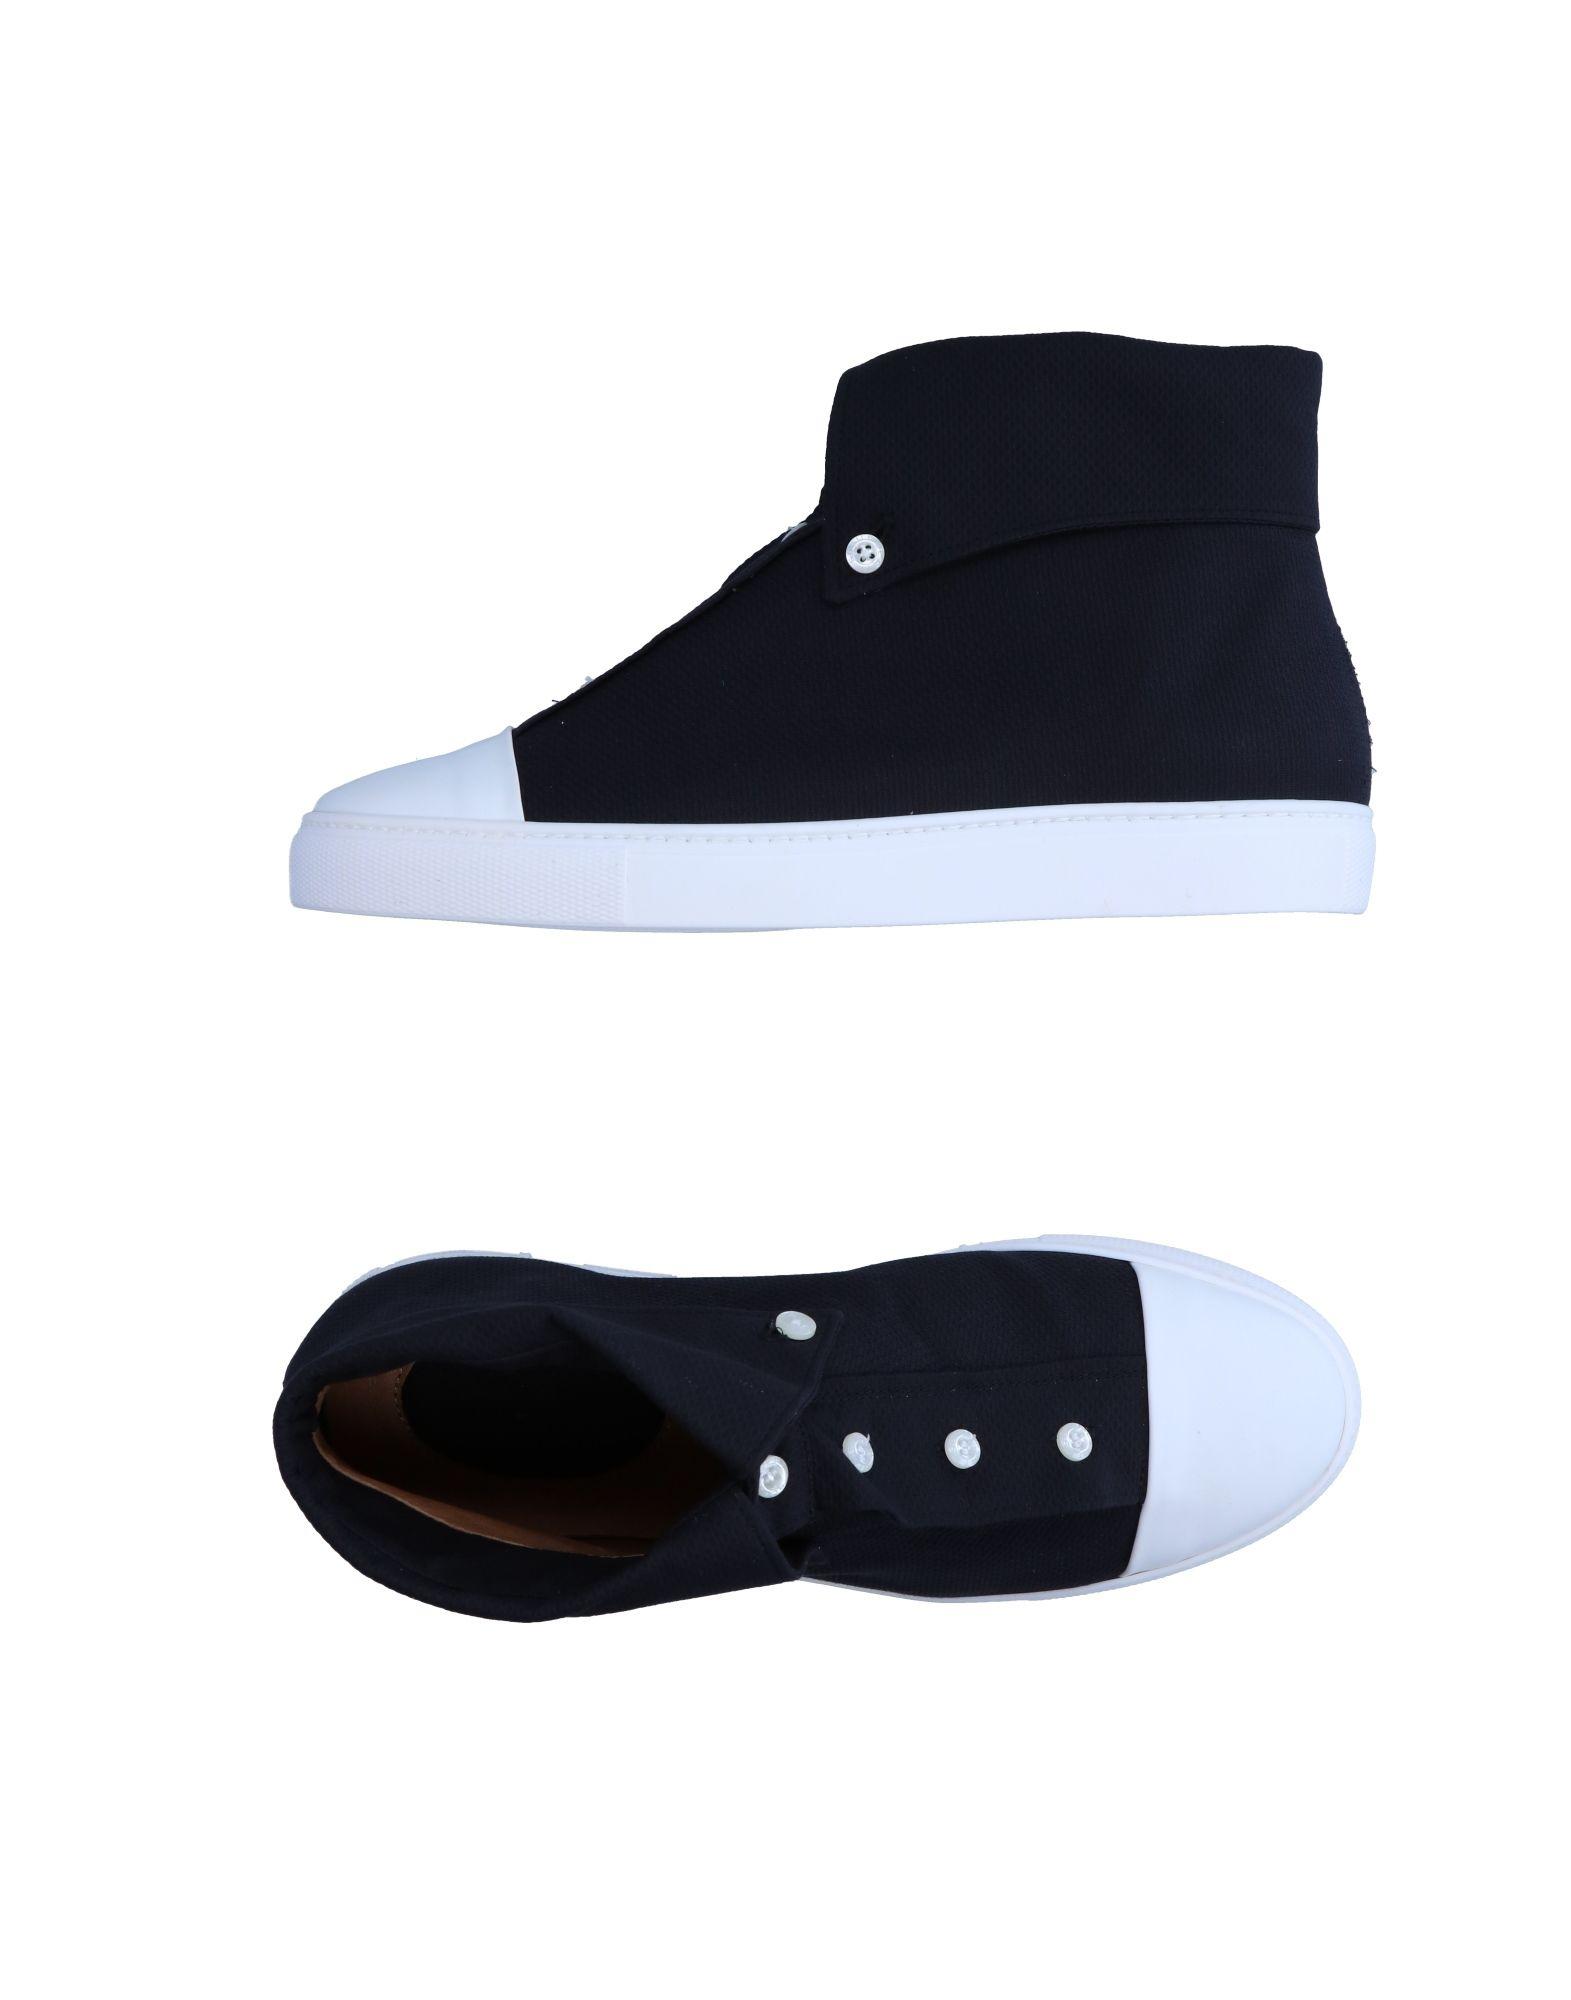 11249643KD Sciuscert Sneakers Herren  11249643KD  f53ae7